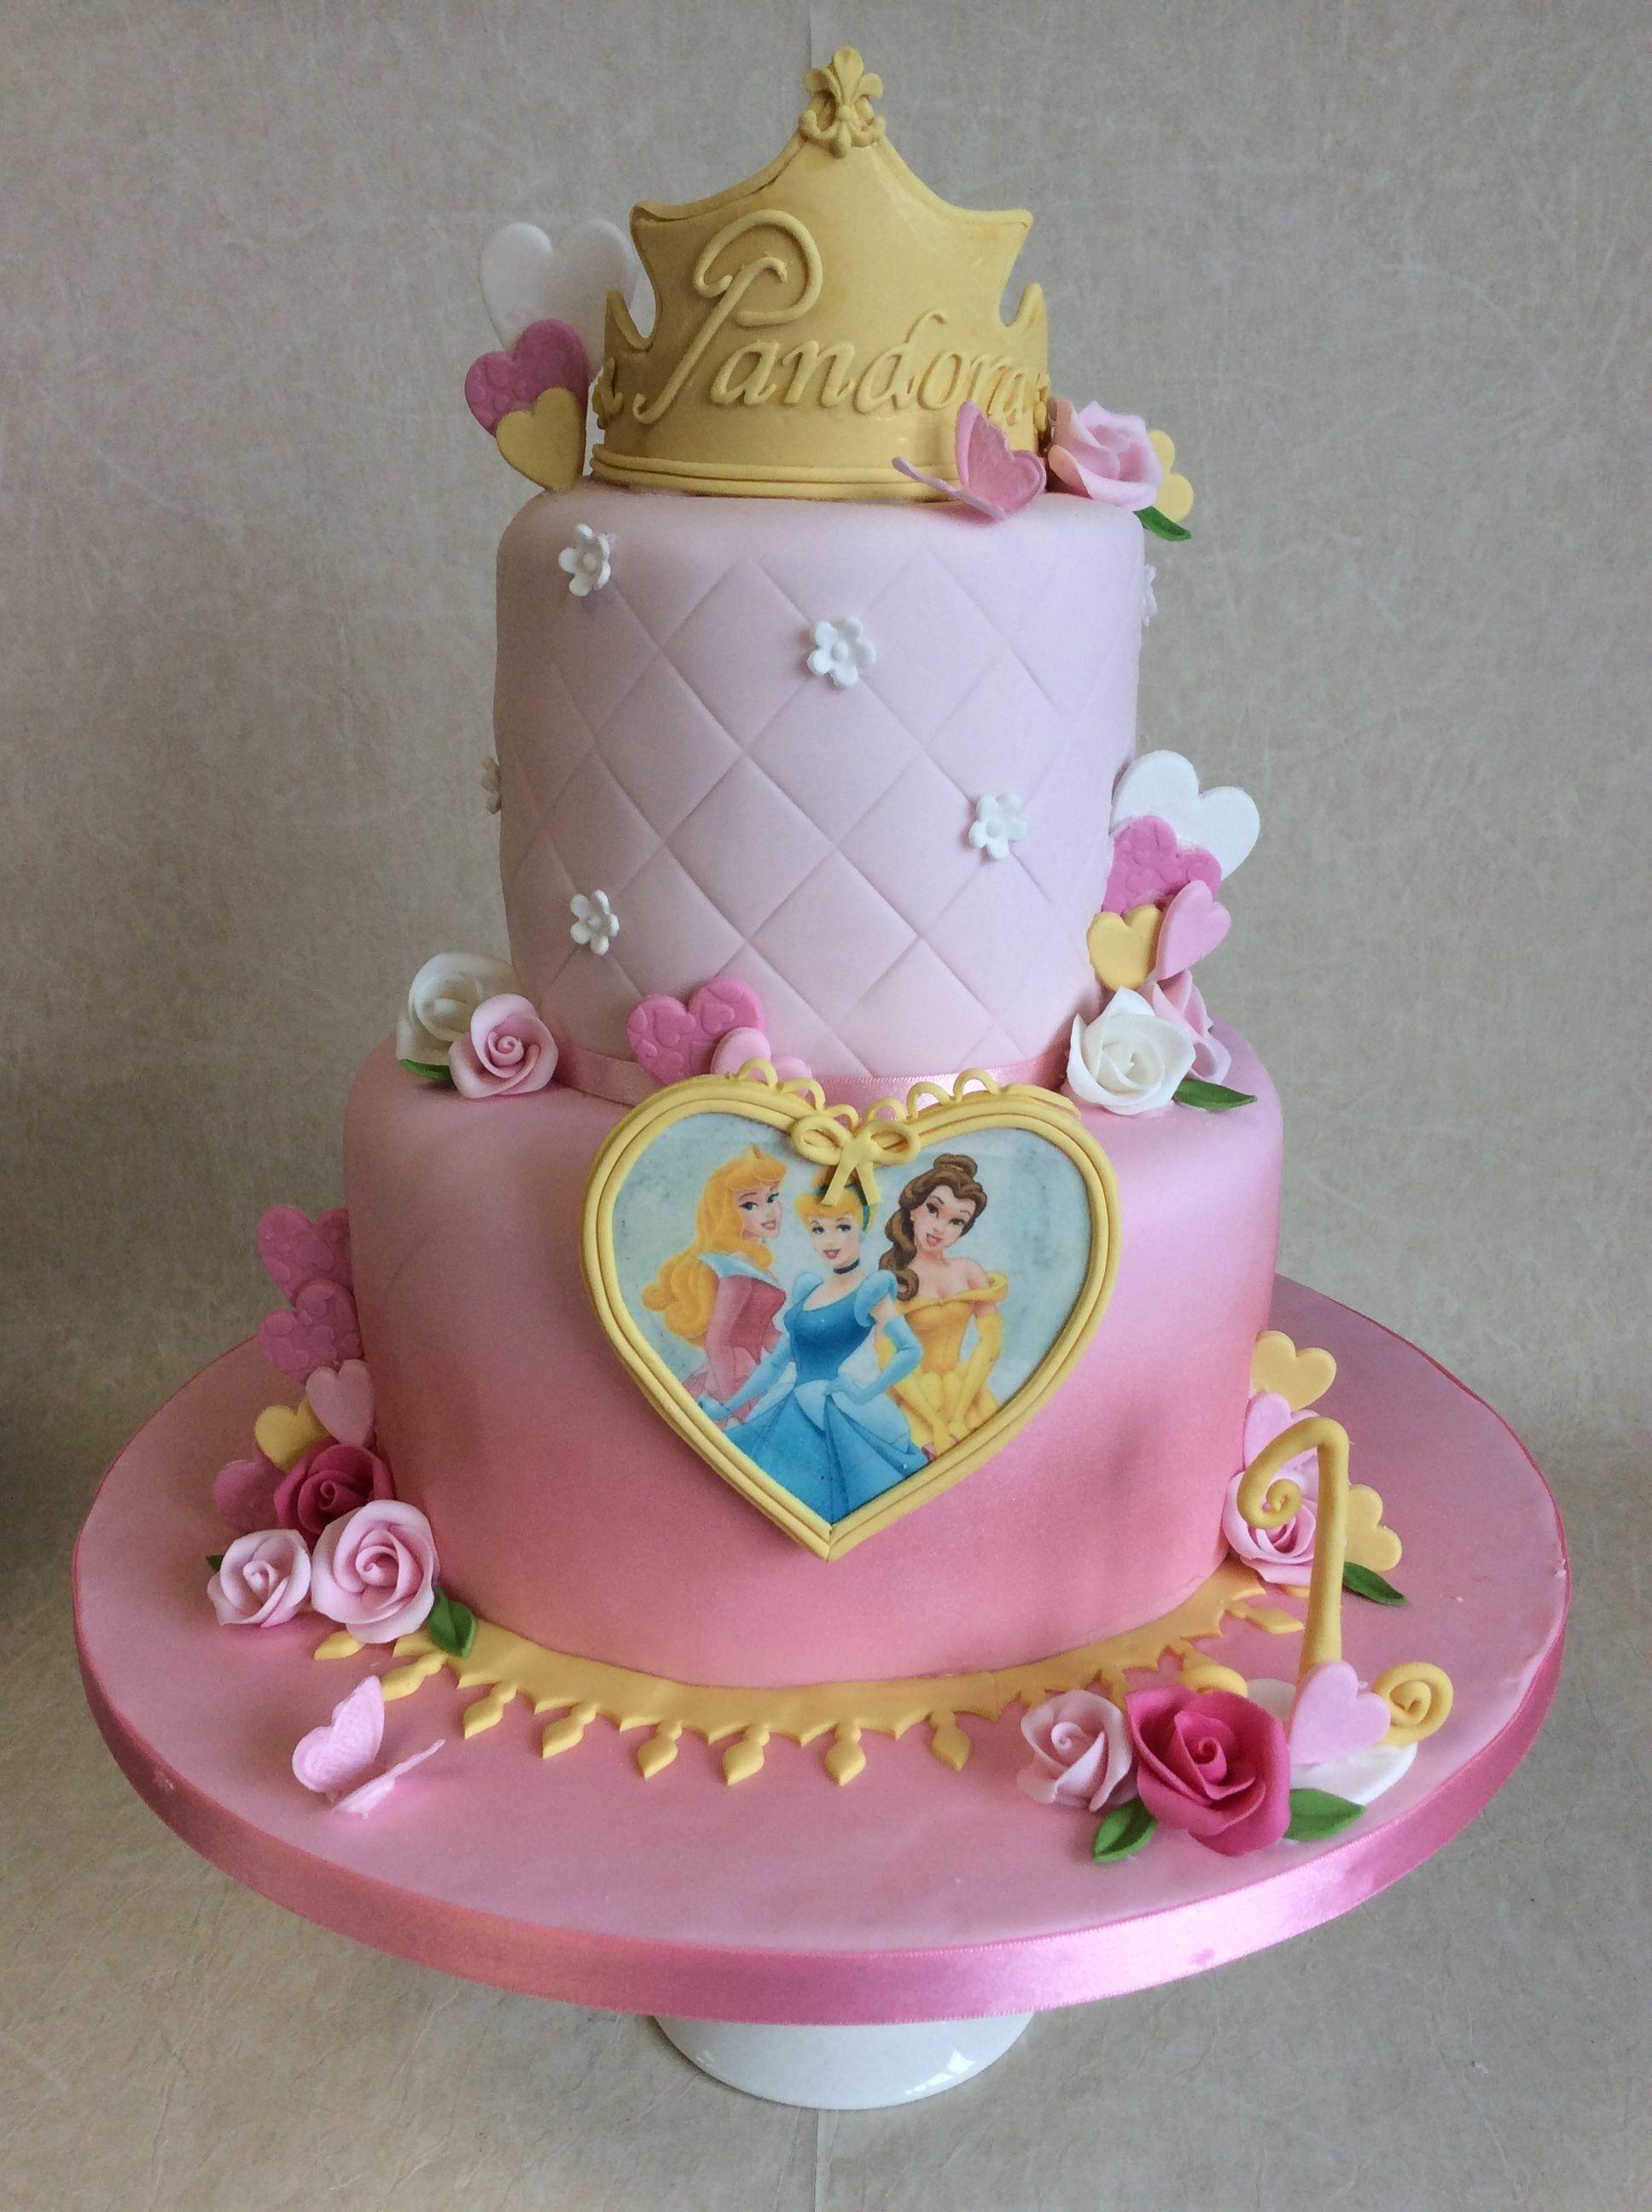 27 Exclusive Photo Of Disney Princess Birthday Cakes Birijus Com Disney Princess Birthday Cakes Princess Birthday Cake Princess Theme Cake